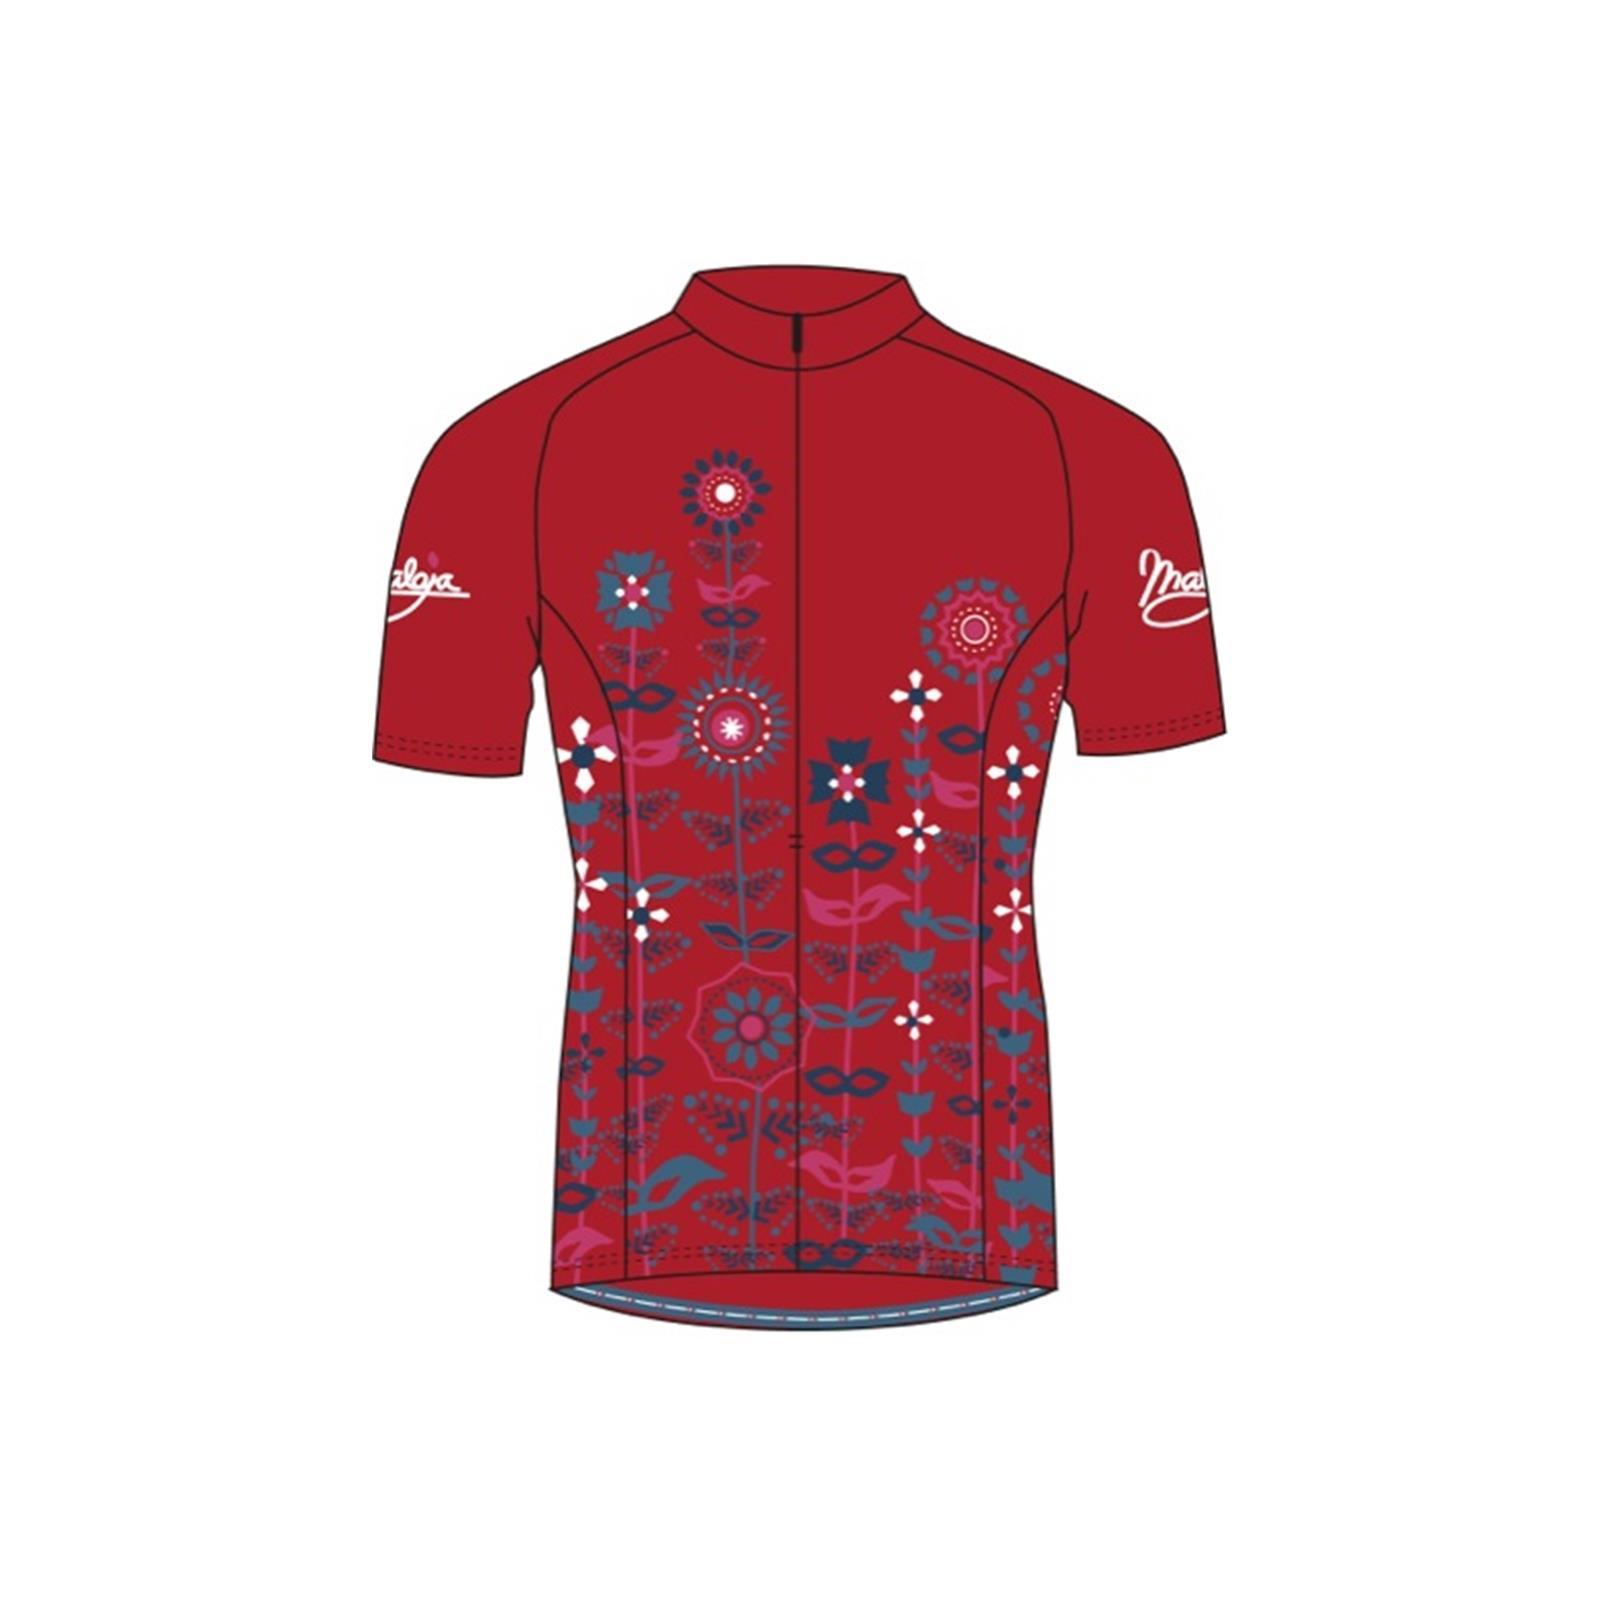 maloja oudayam 1 2 damen rad trikot granat bike shirt fahrradtrikot jersey ebay. Black Bedroom Furniture Sets. Home Design Ideas